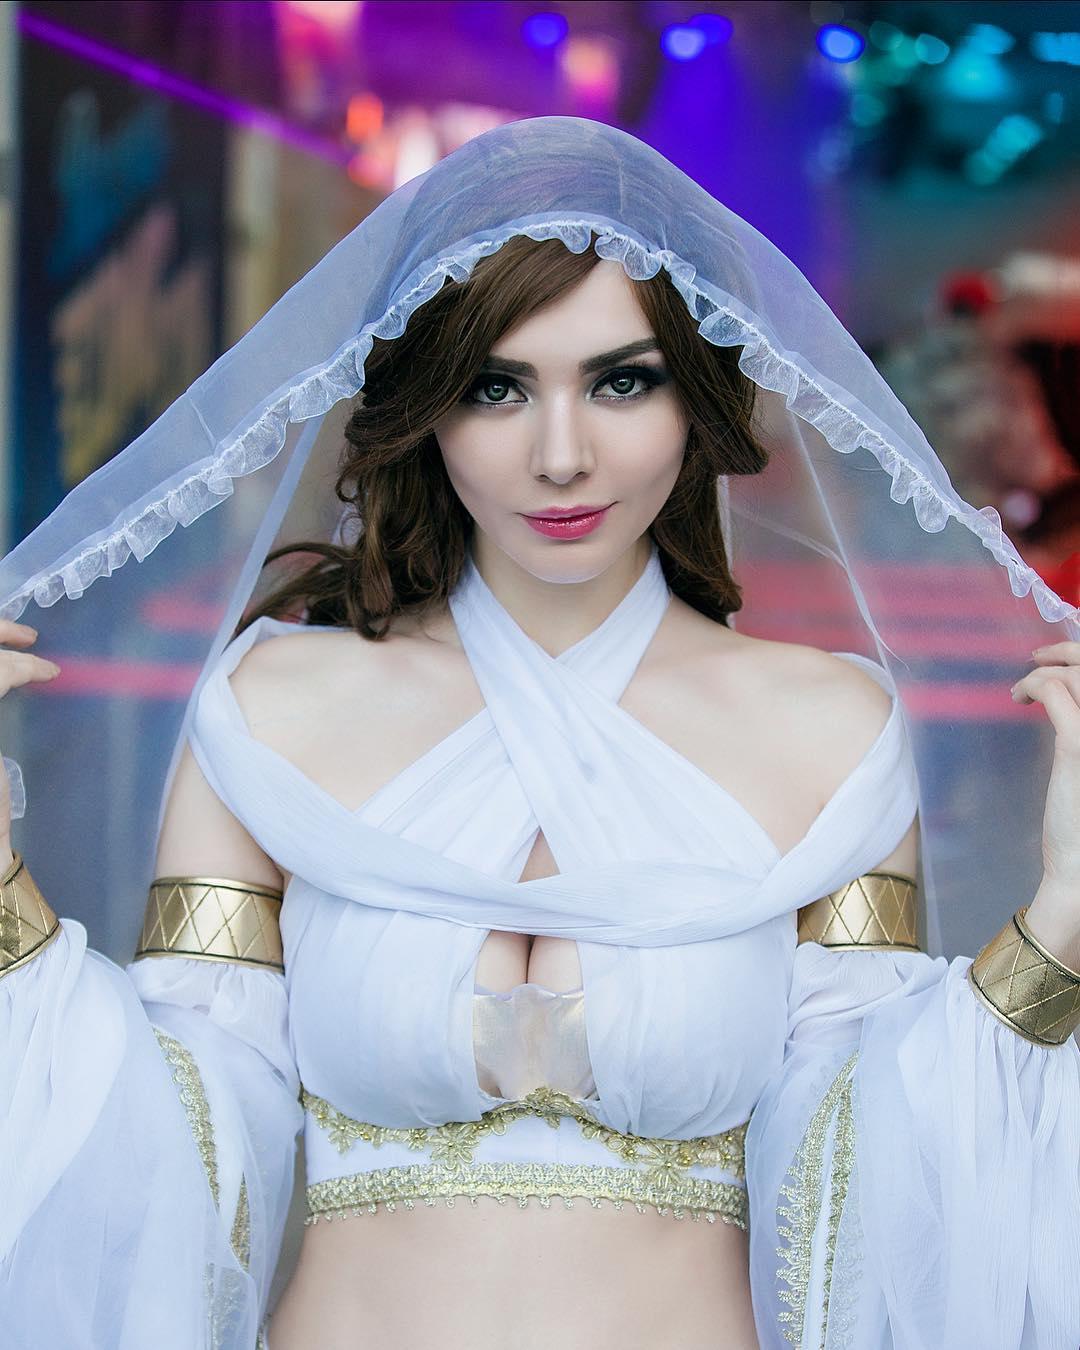 Lindo Cosplay Feminino da Gwynevere Princesa da Luz Solar - Dark Souls - Cosplays Femininos de Games 04